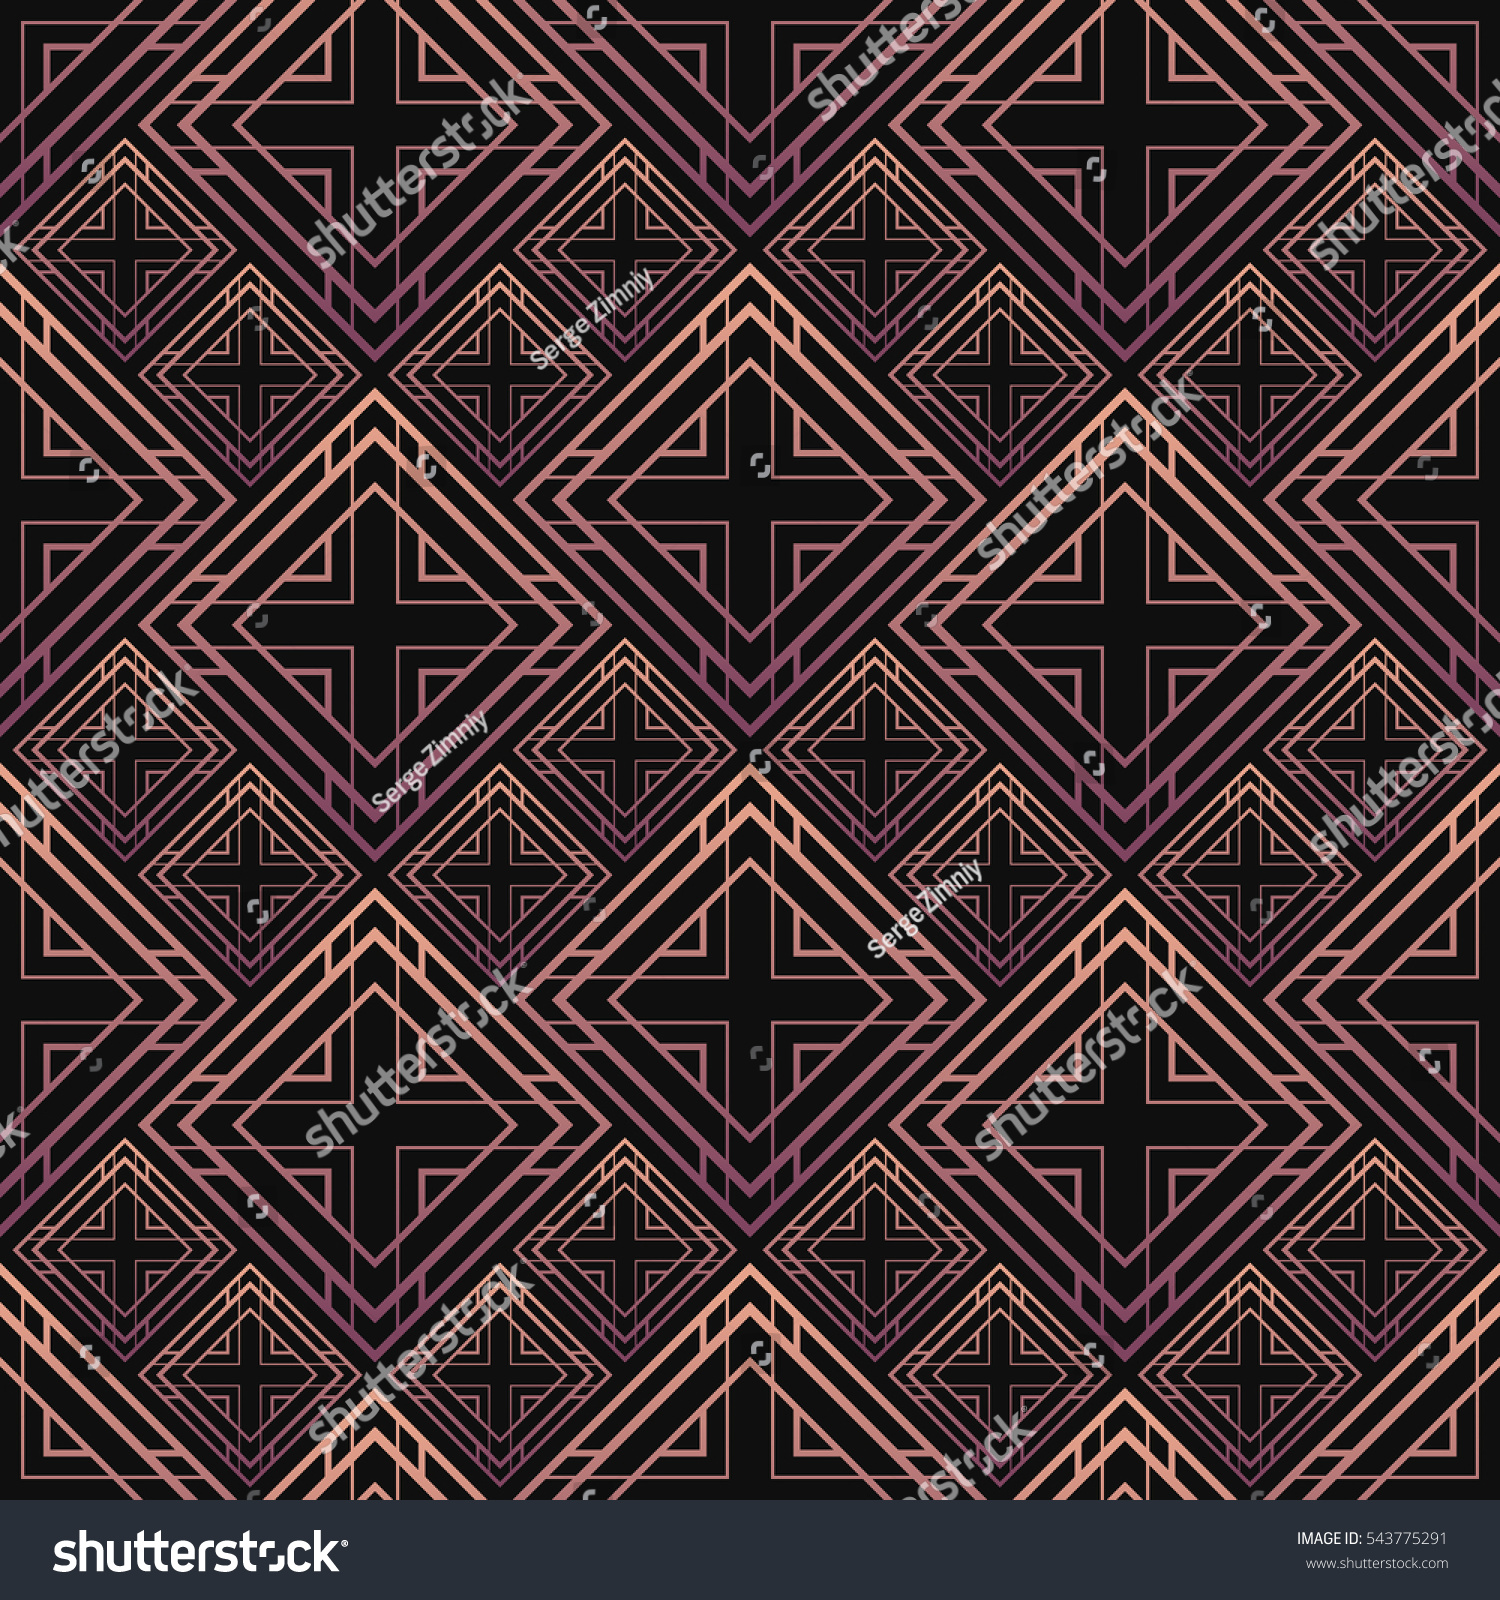 Art deco ceramic tiles images tile flooring design ideas seamless pattern art deco style black stock vector 543775291 seamless pattern in art deco style black dailygadgetfo Images